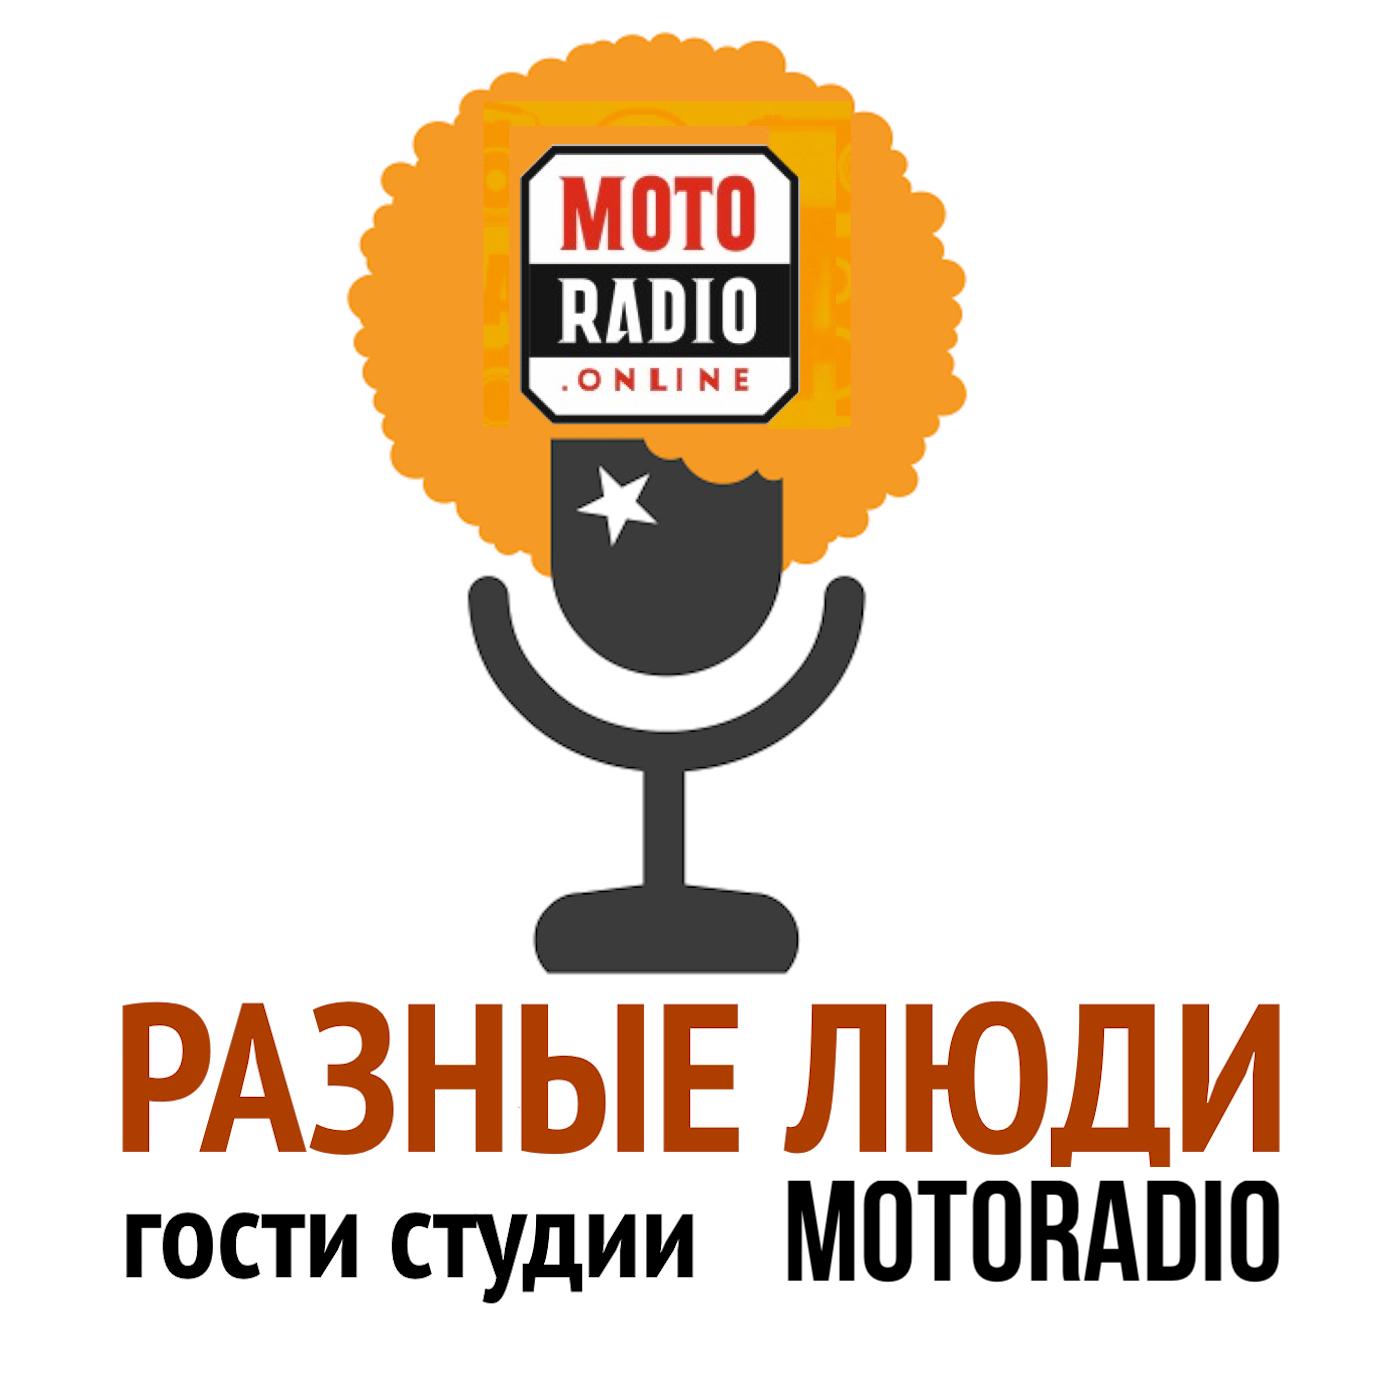 Моторадио Михаил Морозов, актер БДТ в гостях на радио Imagine.